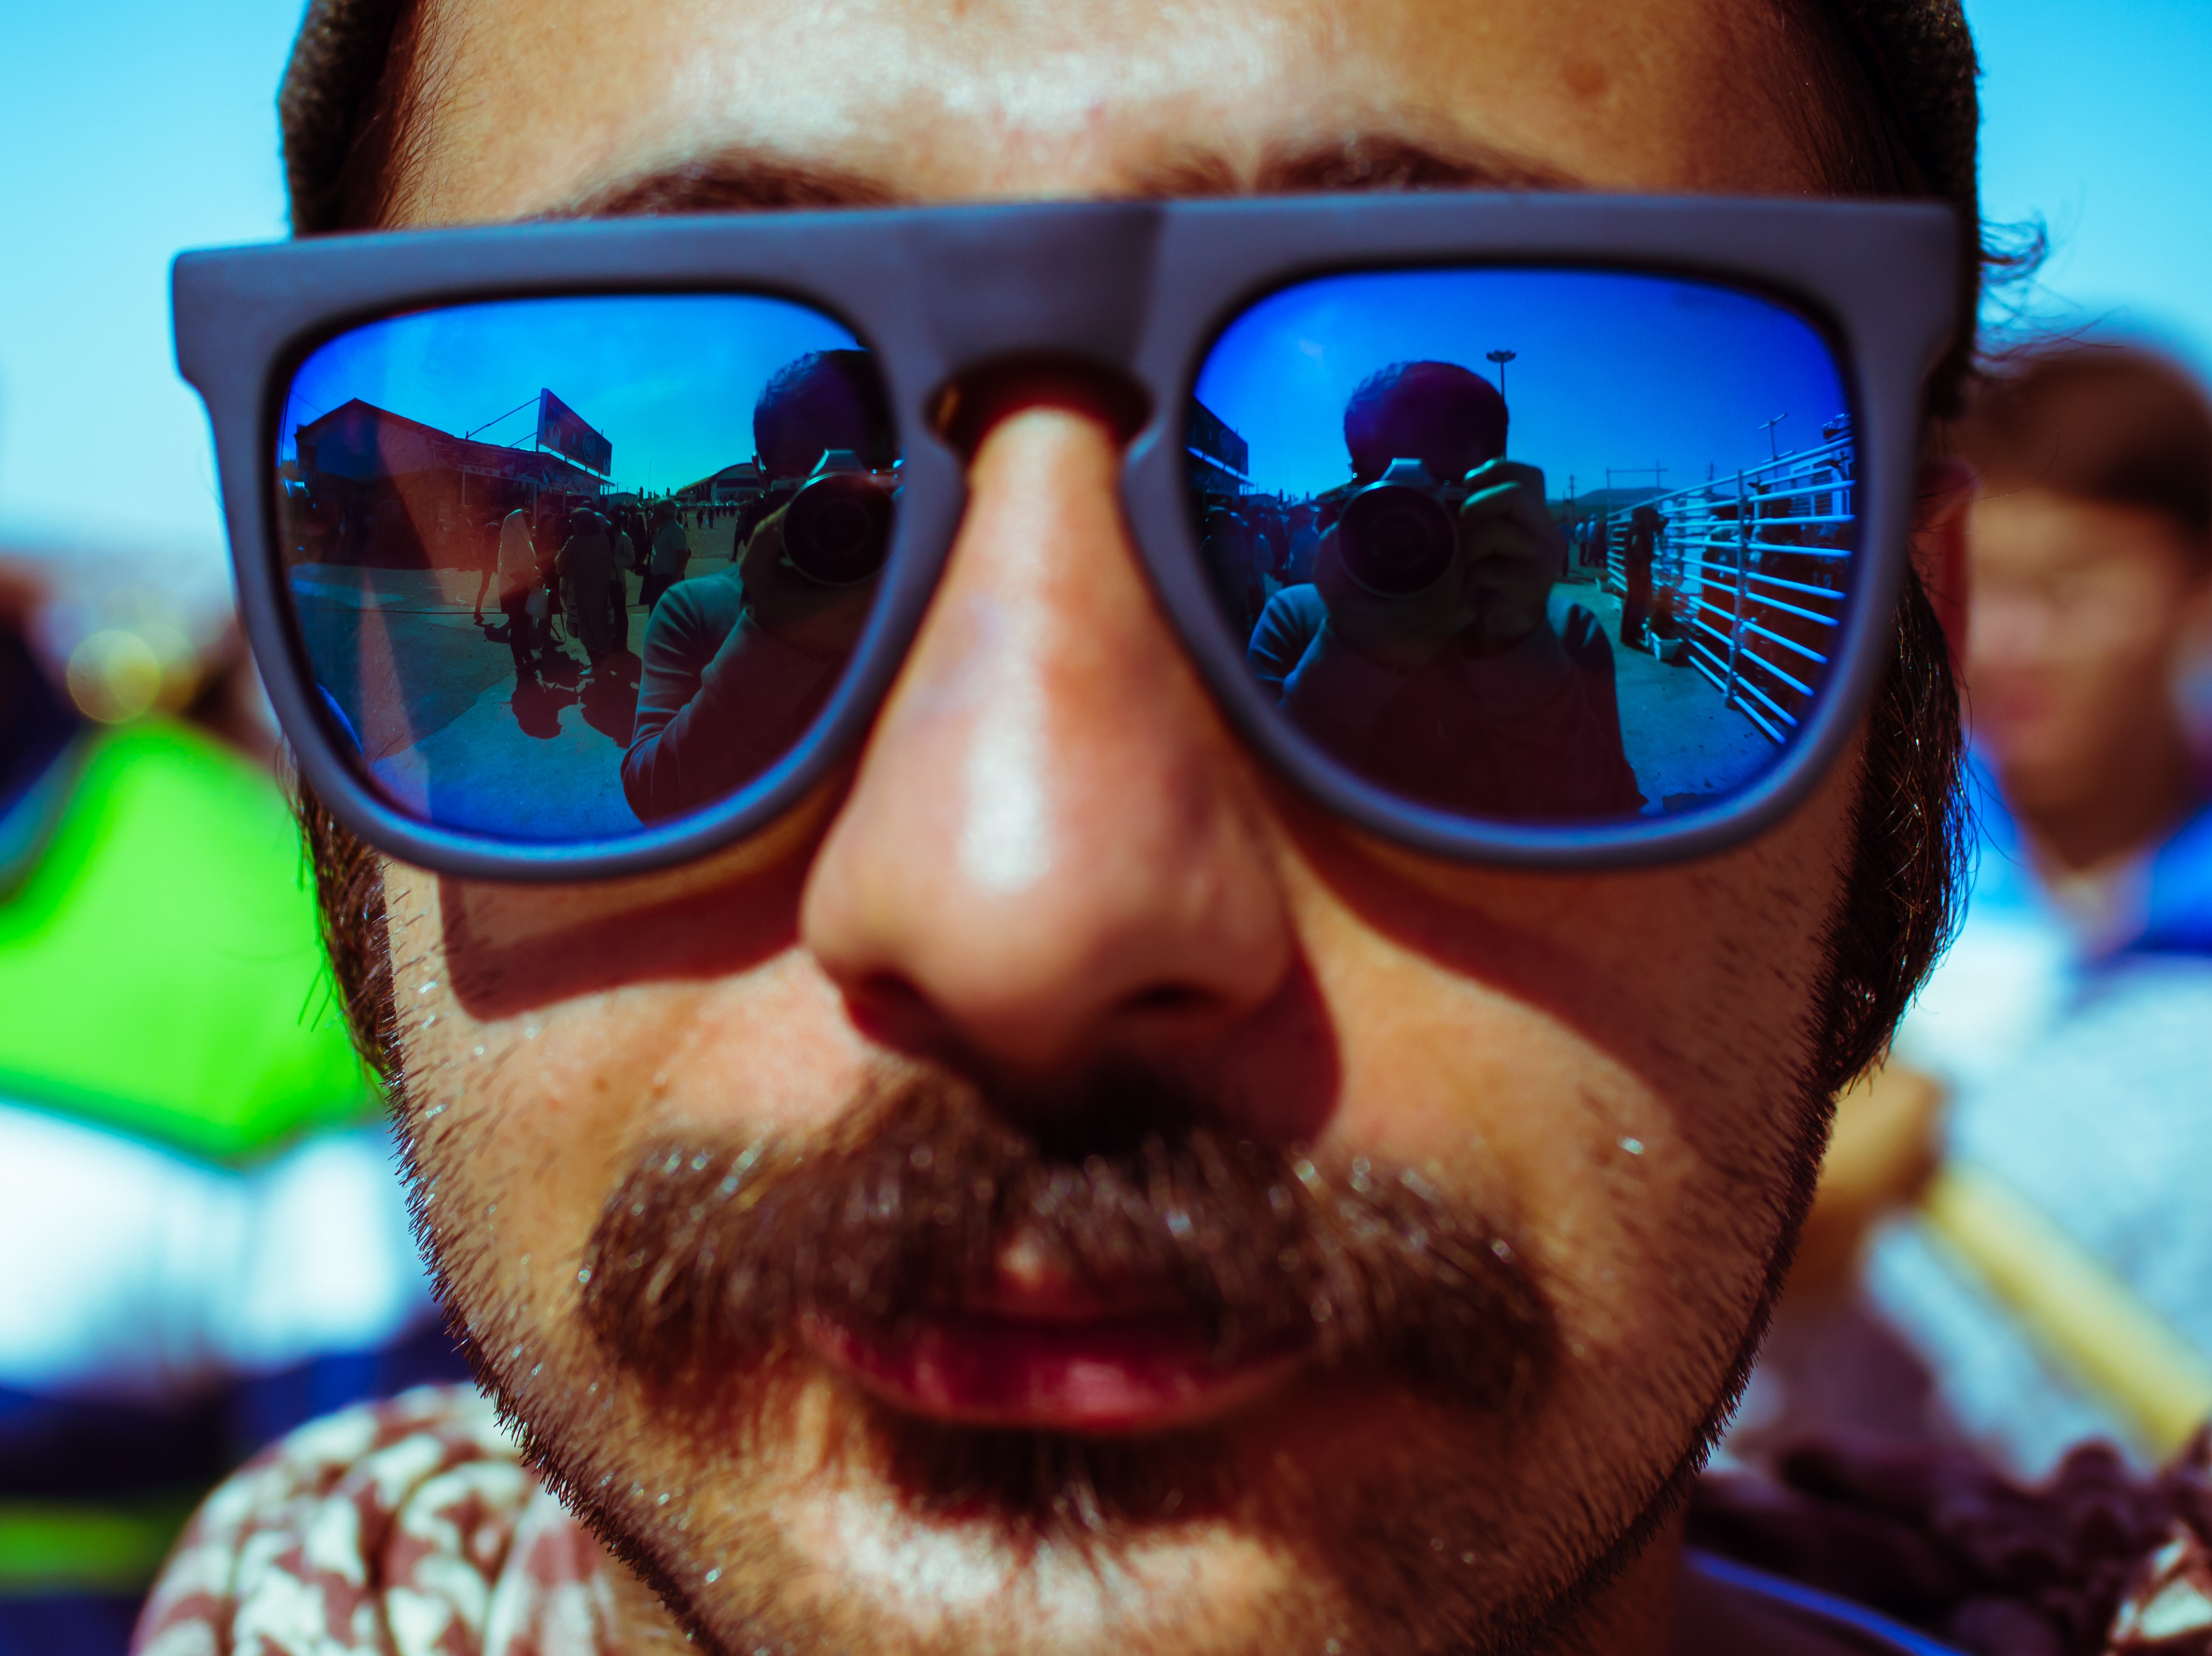 Man Wearing Black Framed Sunglasses, Close-up, Daylight, Eyewear, Face, HQ Photo